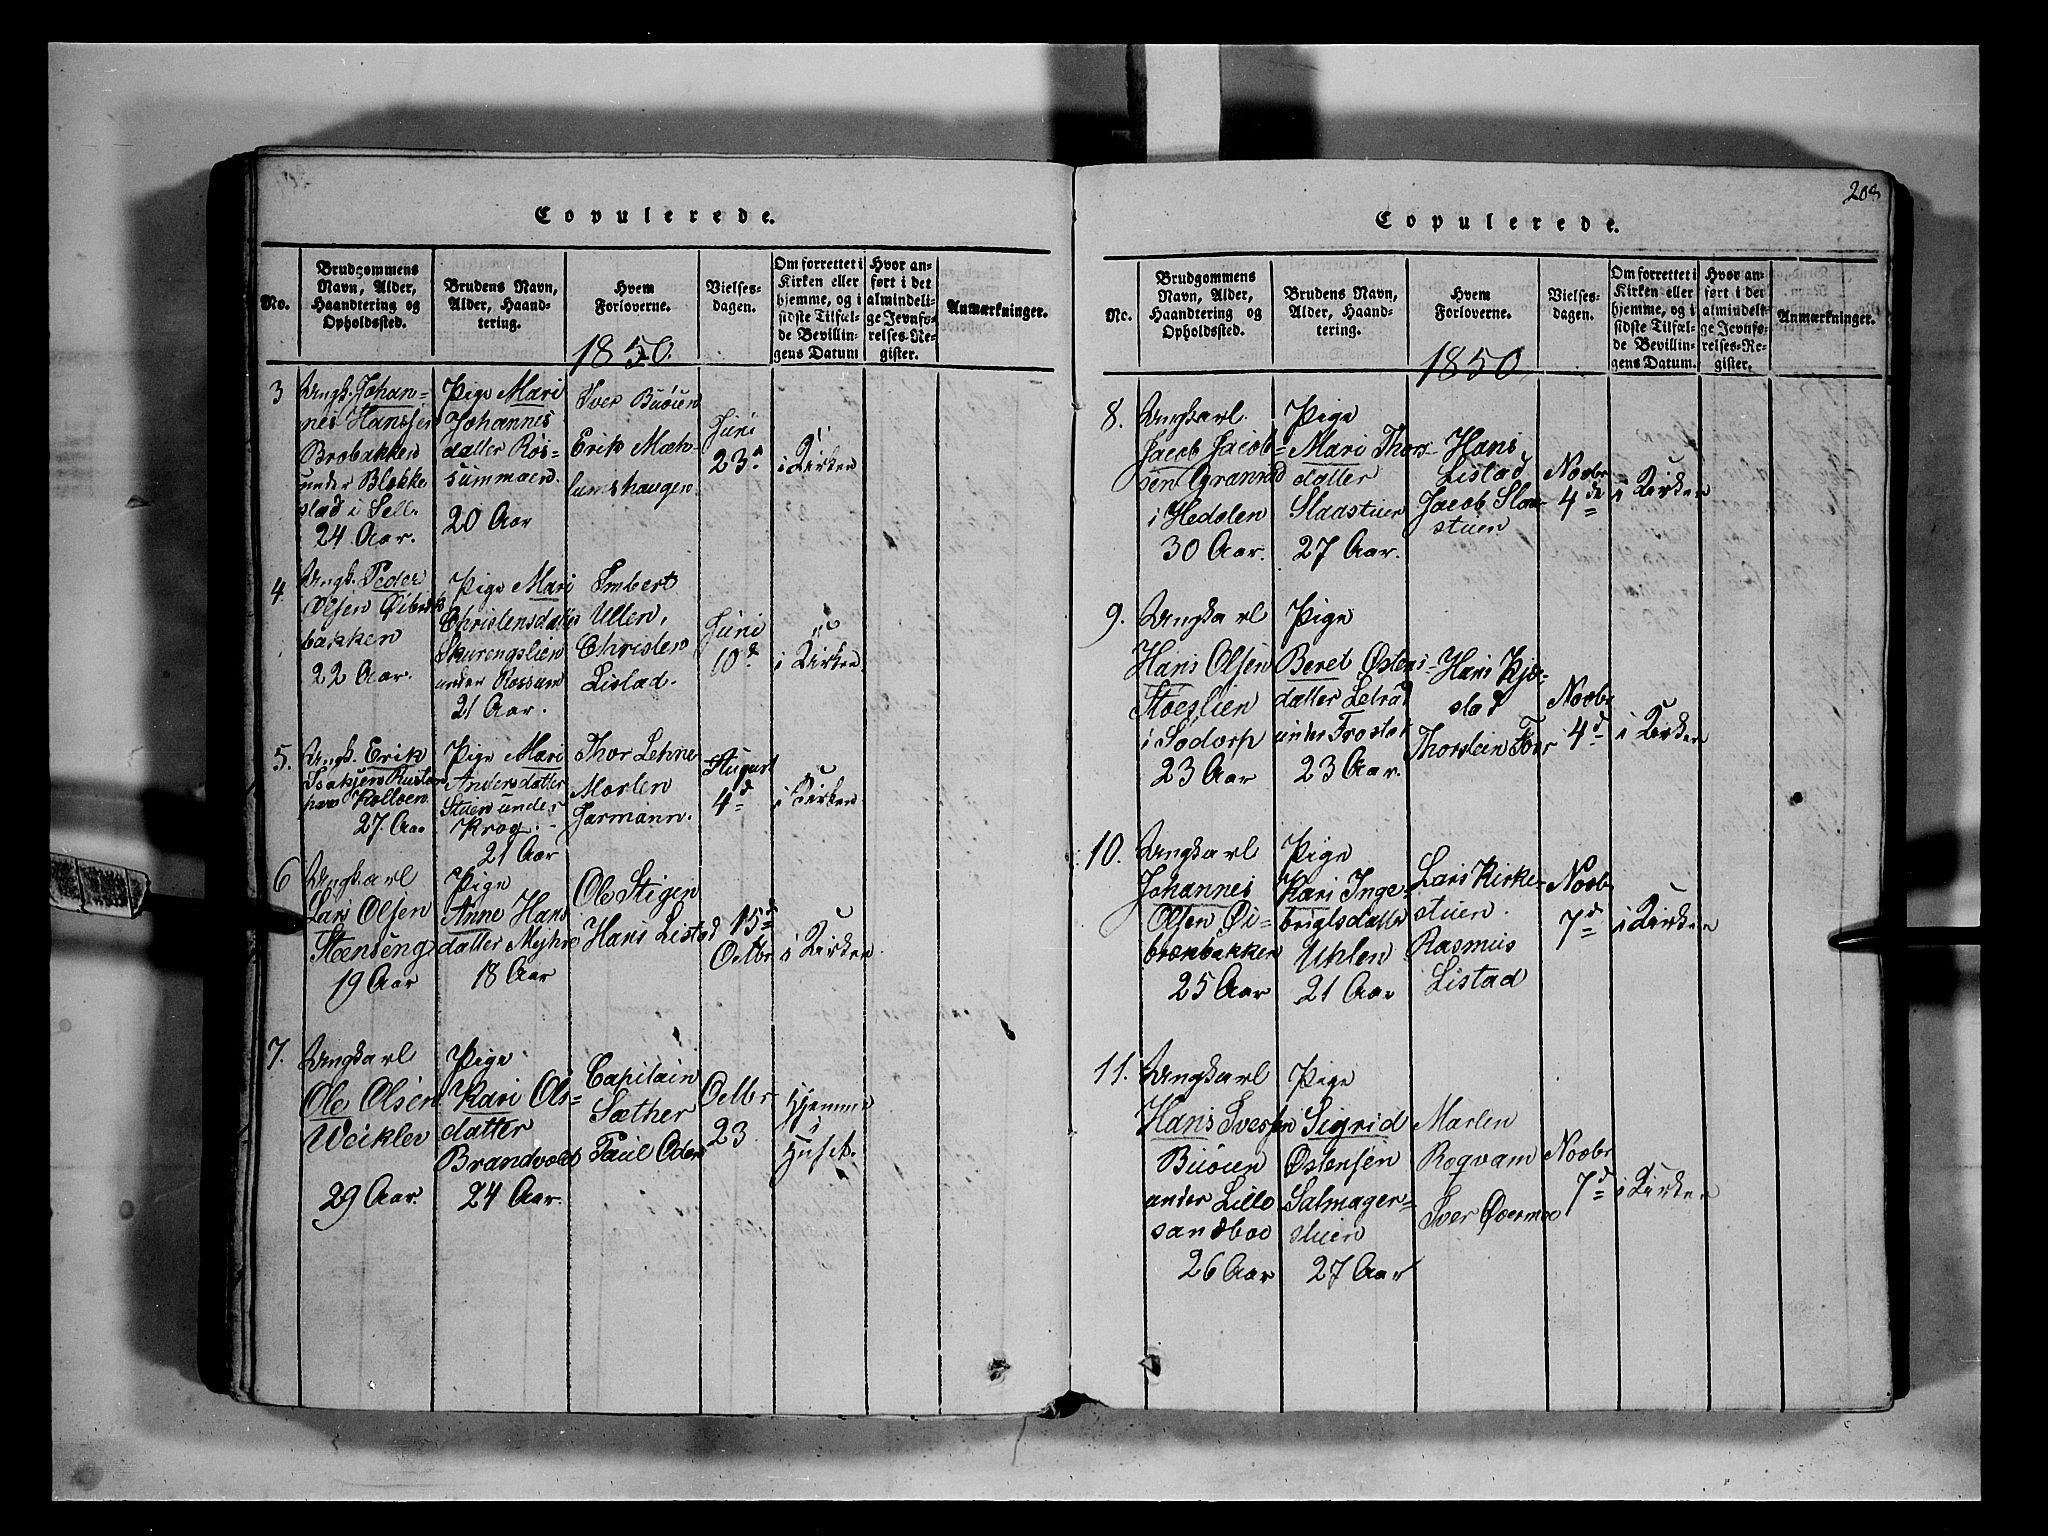 SAH, Fron prestekontor, H/Ha/Hab/L0002: Klokkerbok nr. 2, 1816-1850, s. 208